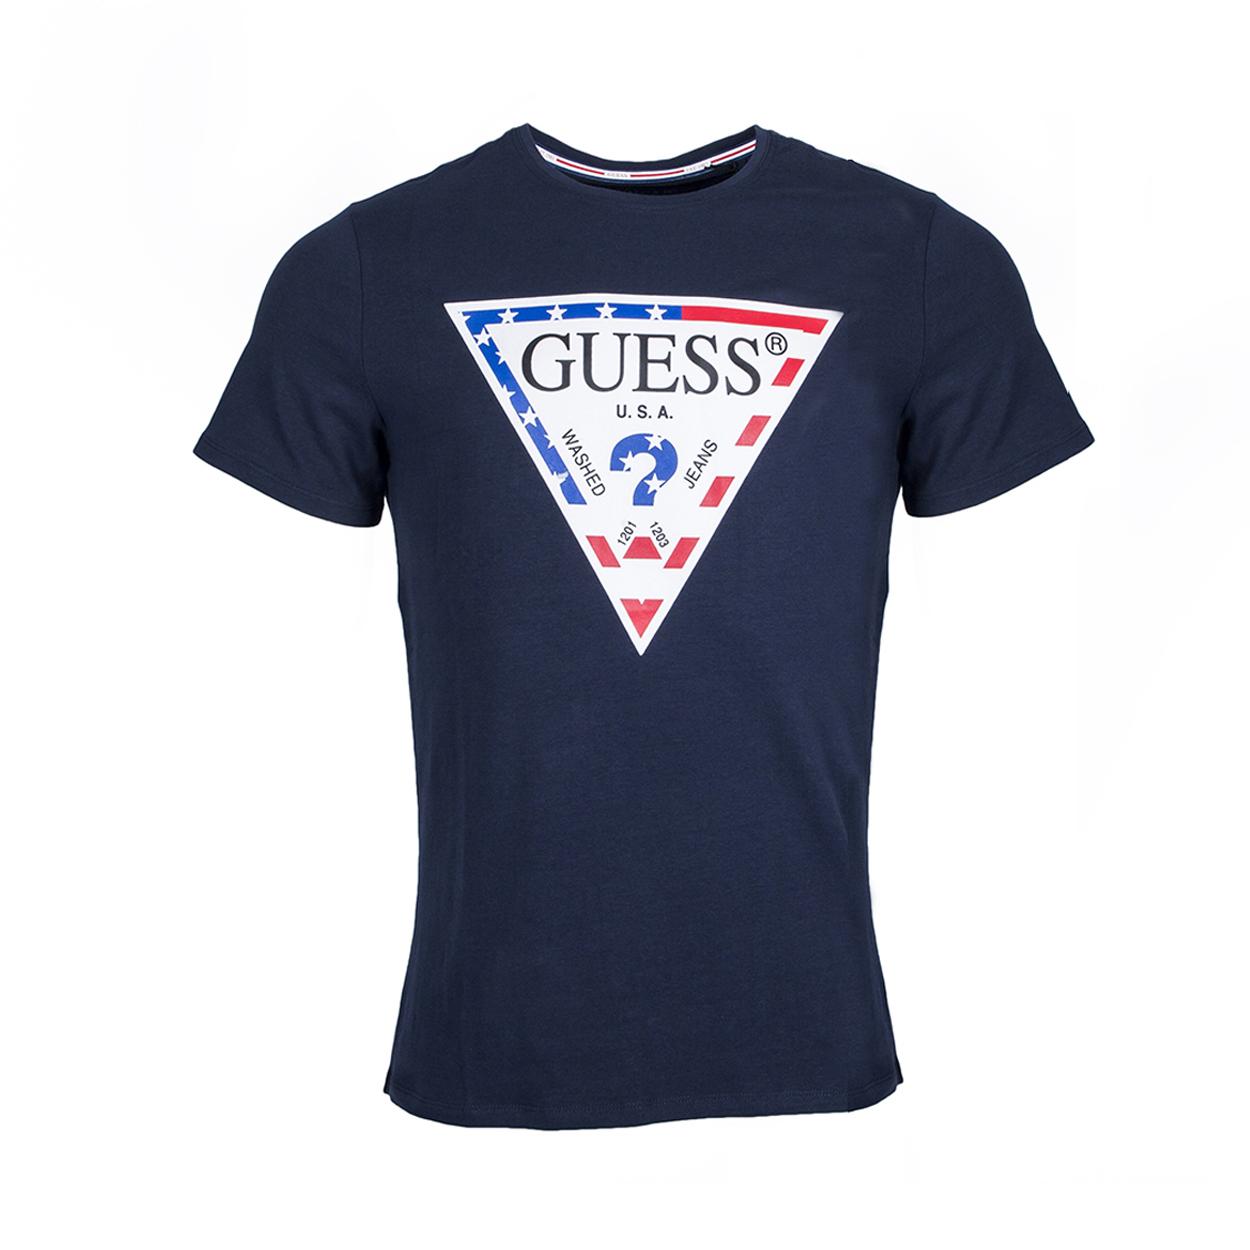 Tee-shirt col rond guess stars and stripes en coton stretch bleu marine floqué